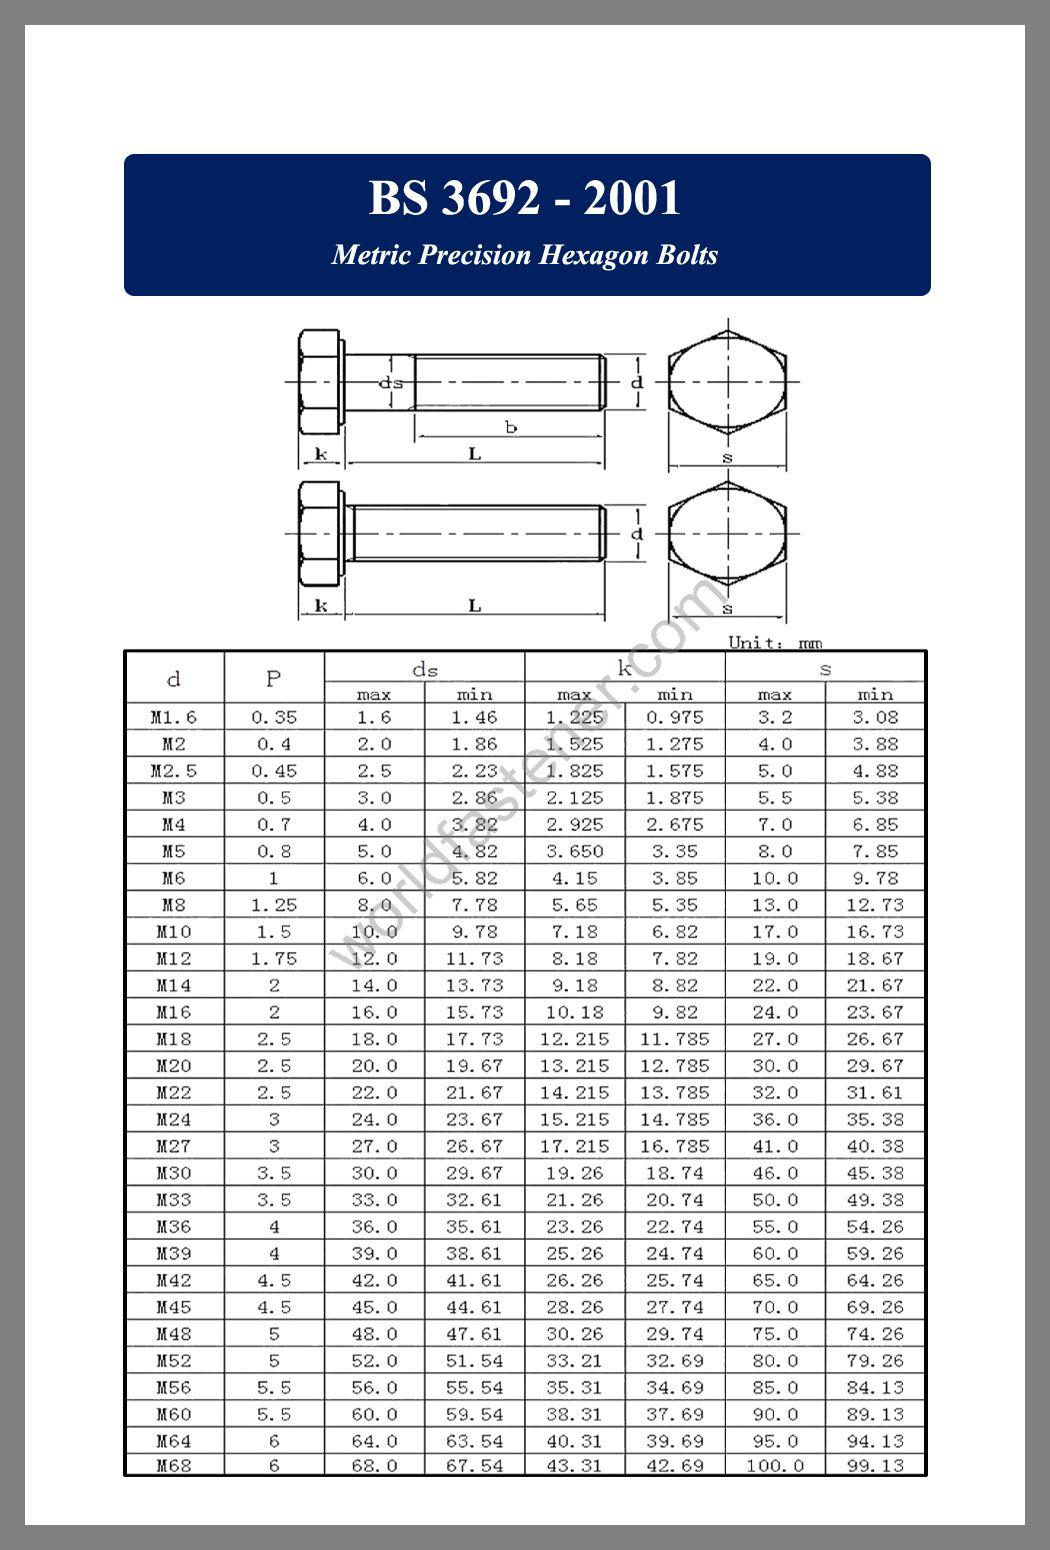 BS 3692, BS 3692 Metric Precision Hexagon Bolts, fastener, screw, bolt, BS Bolt, BS fastener